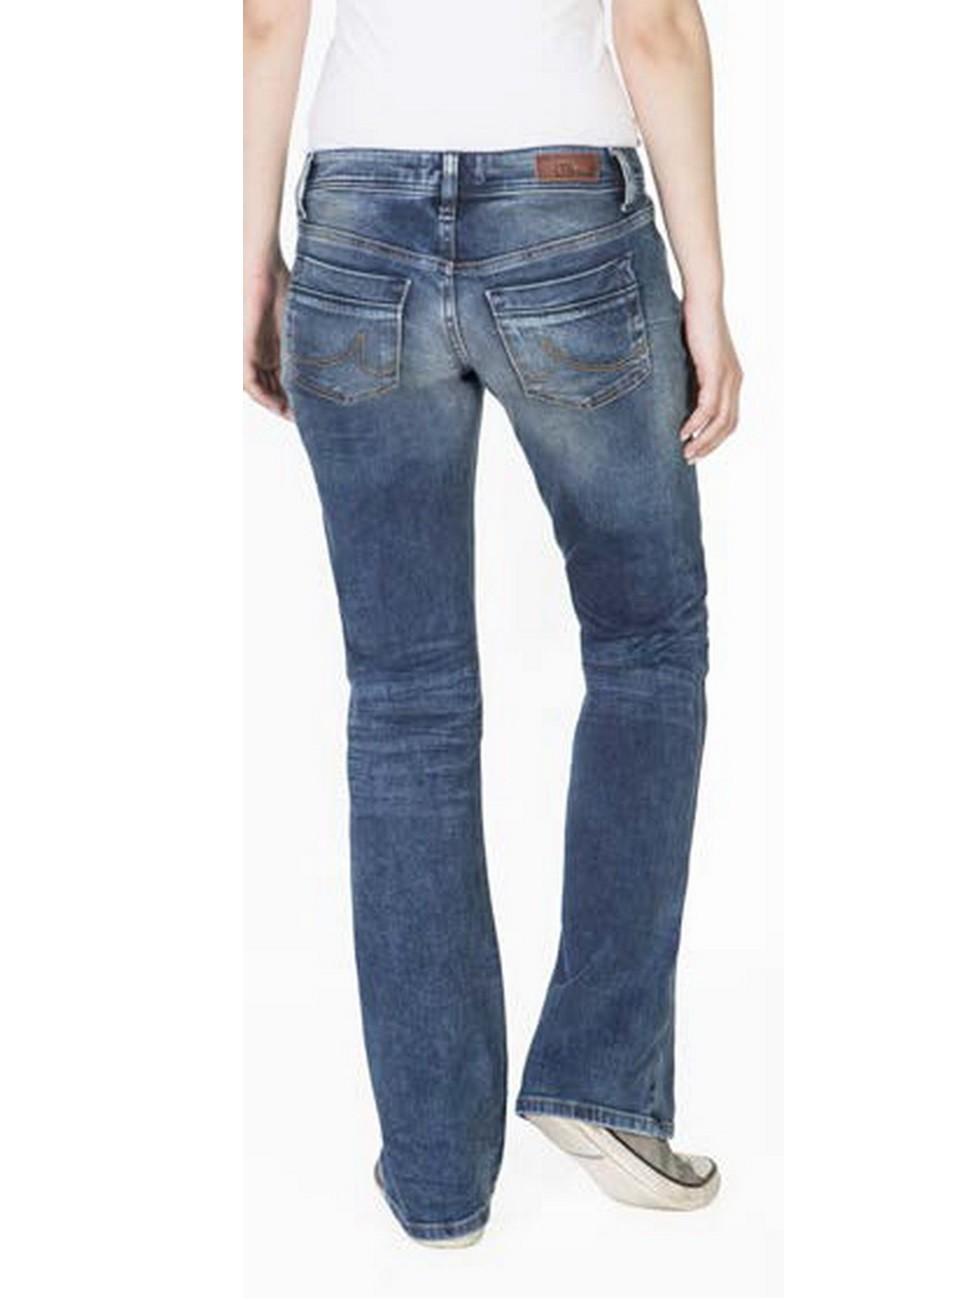 ltb damen jeans valerie bootcut roswell wash ebay. Black Bedroom Furniture Sets. Home Design Ideas